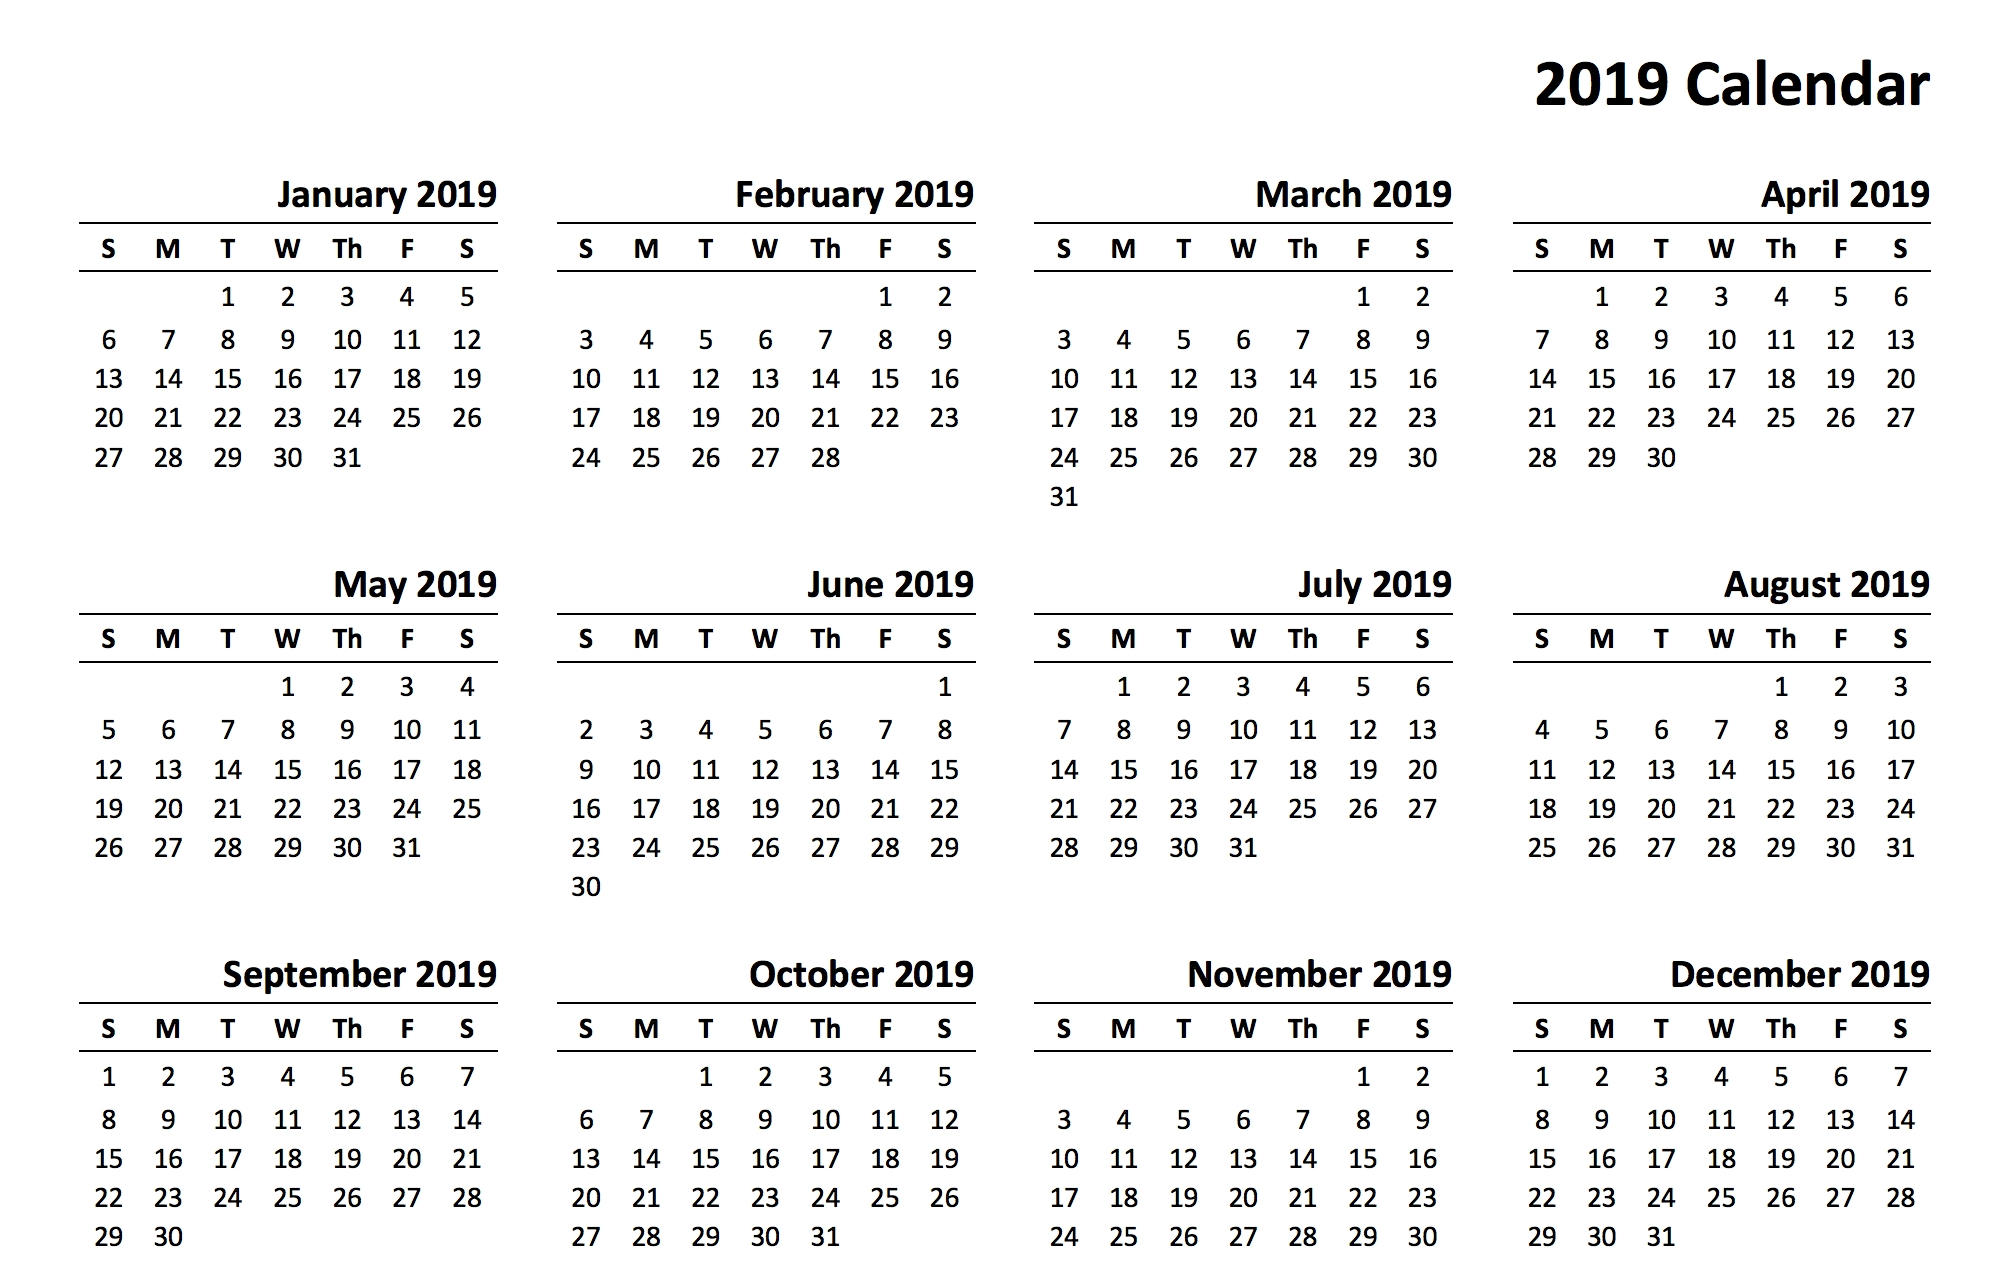 Bill Pay Calendar 2019 Printable – Template Calendar Design